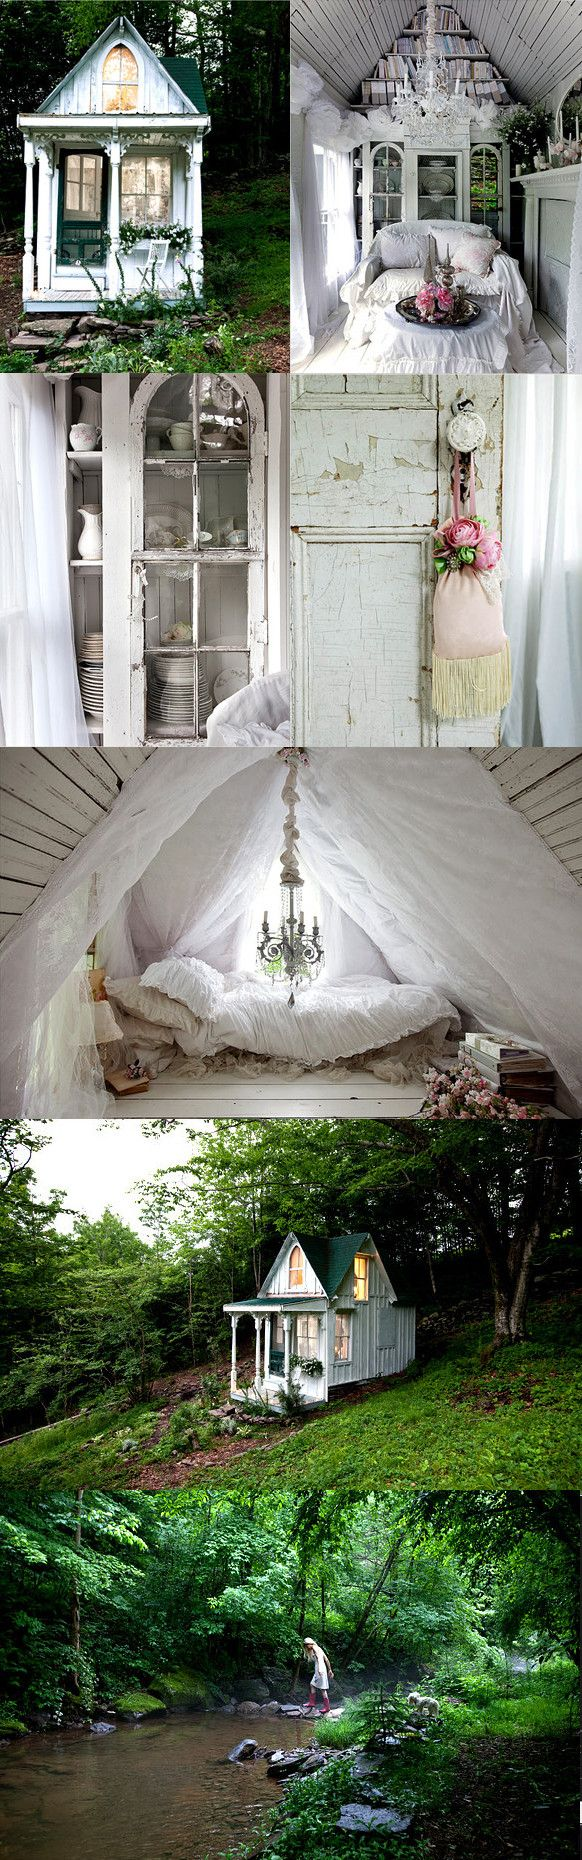 Personal Hideway; an old Victorian cottage - http://imgur.com/UENL6GU